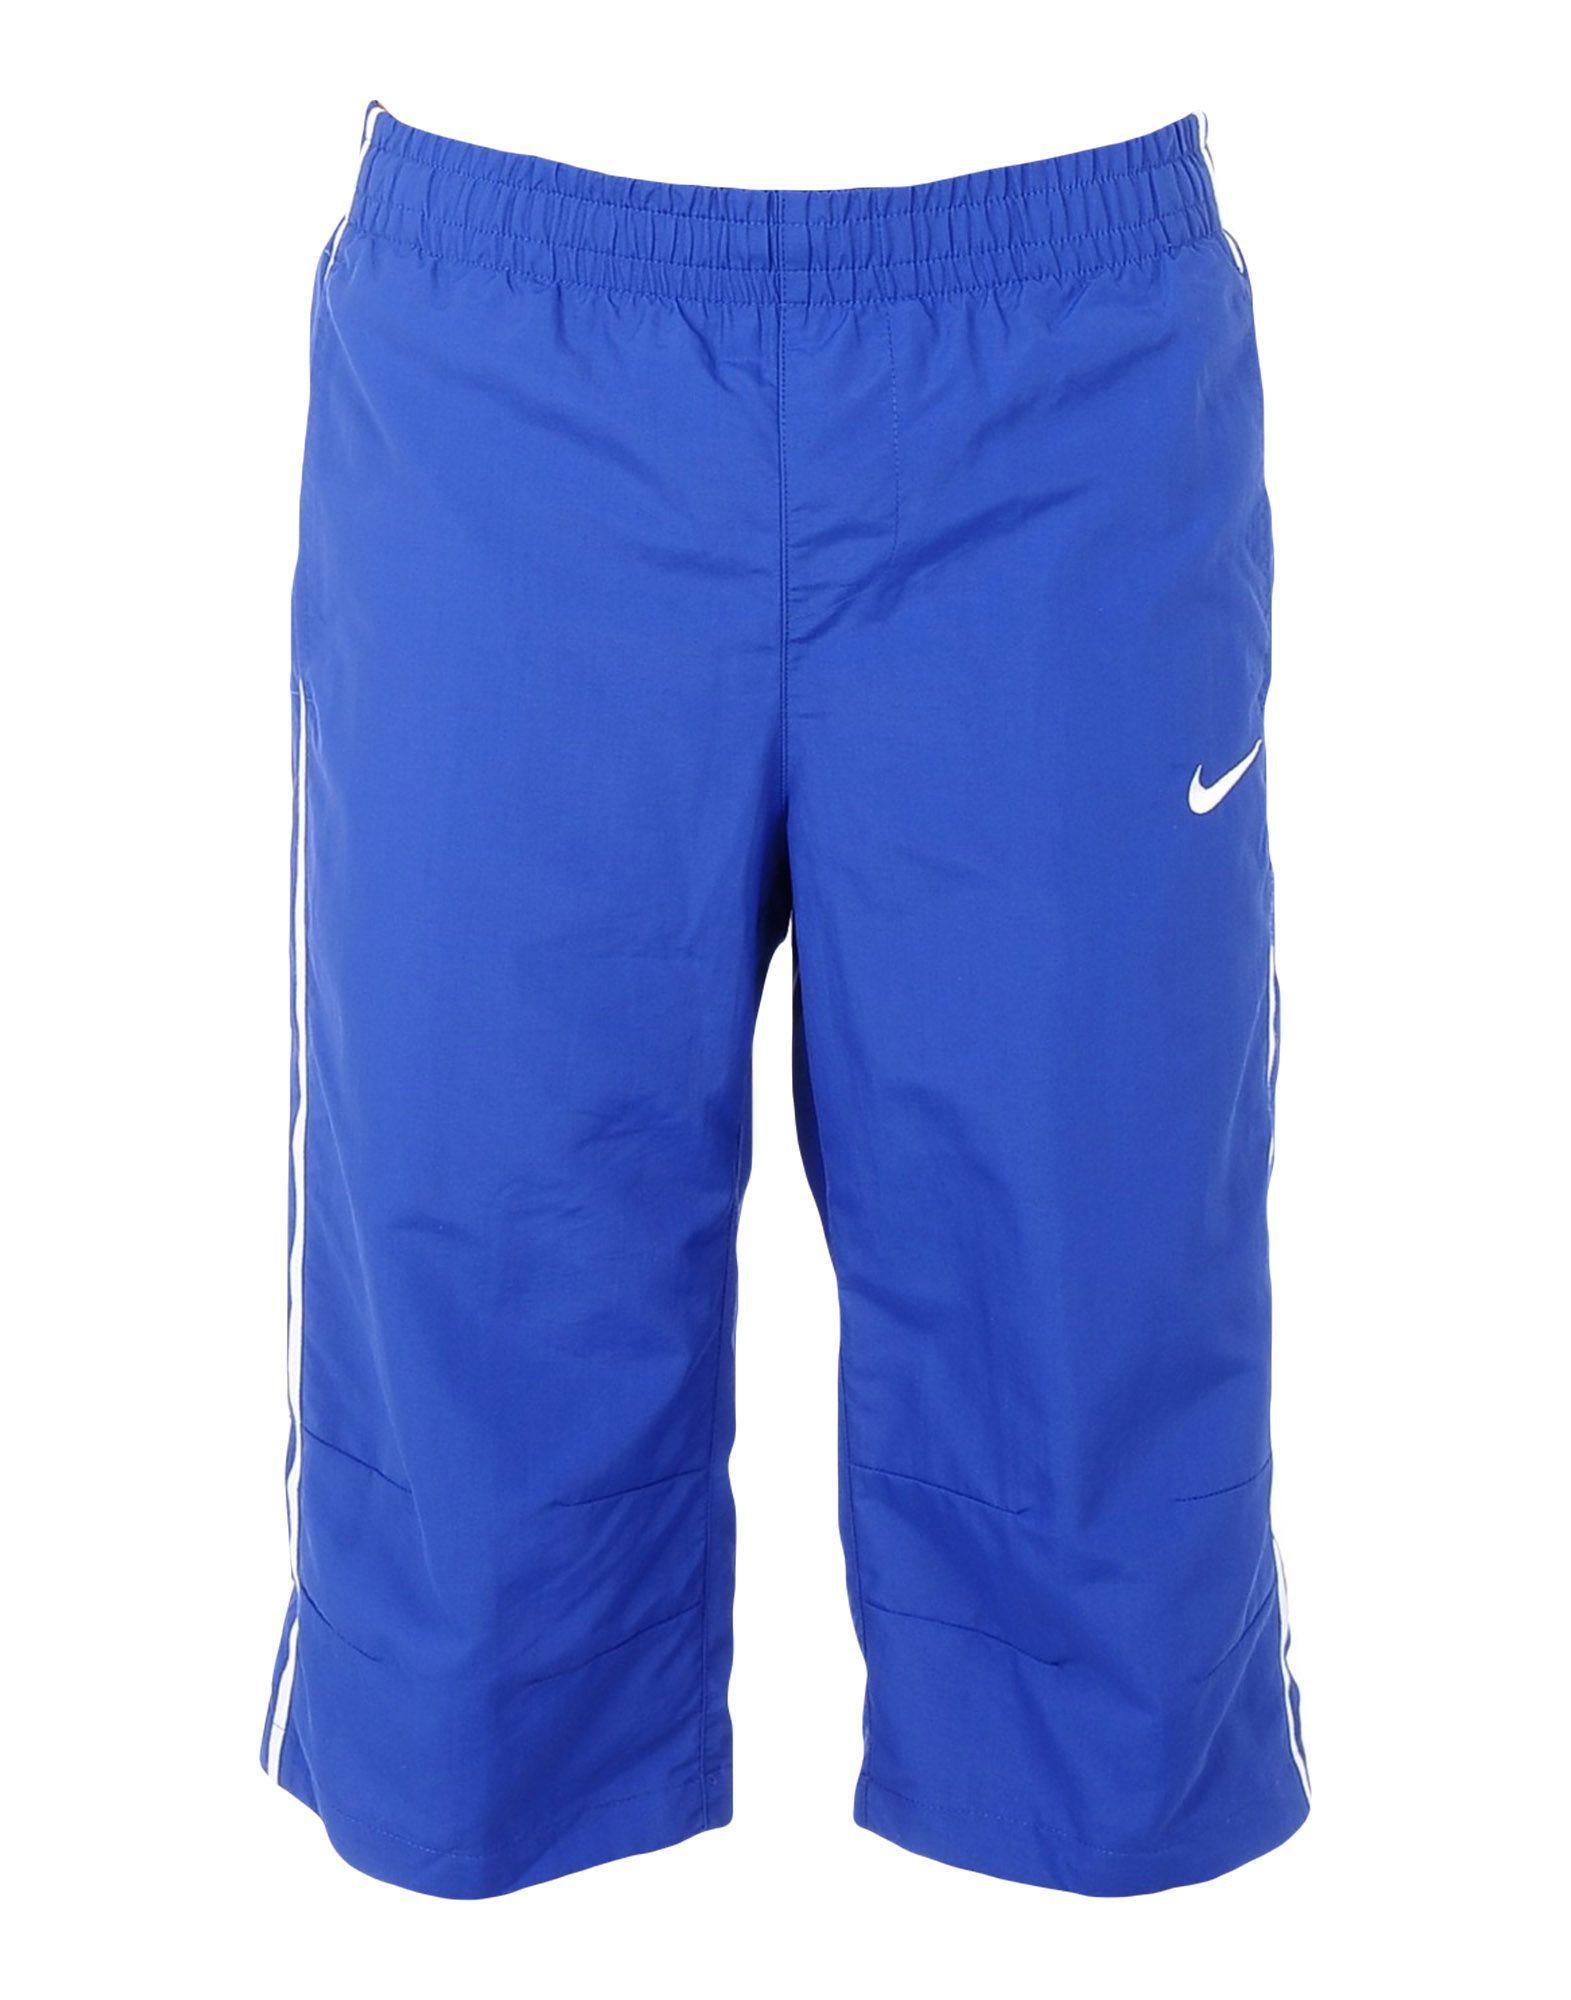 Nike Swim Shorts In Bright Blue